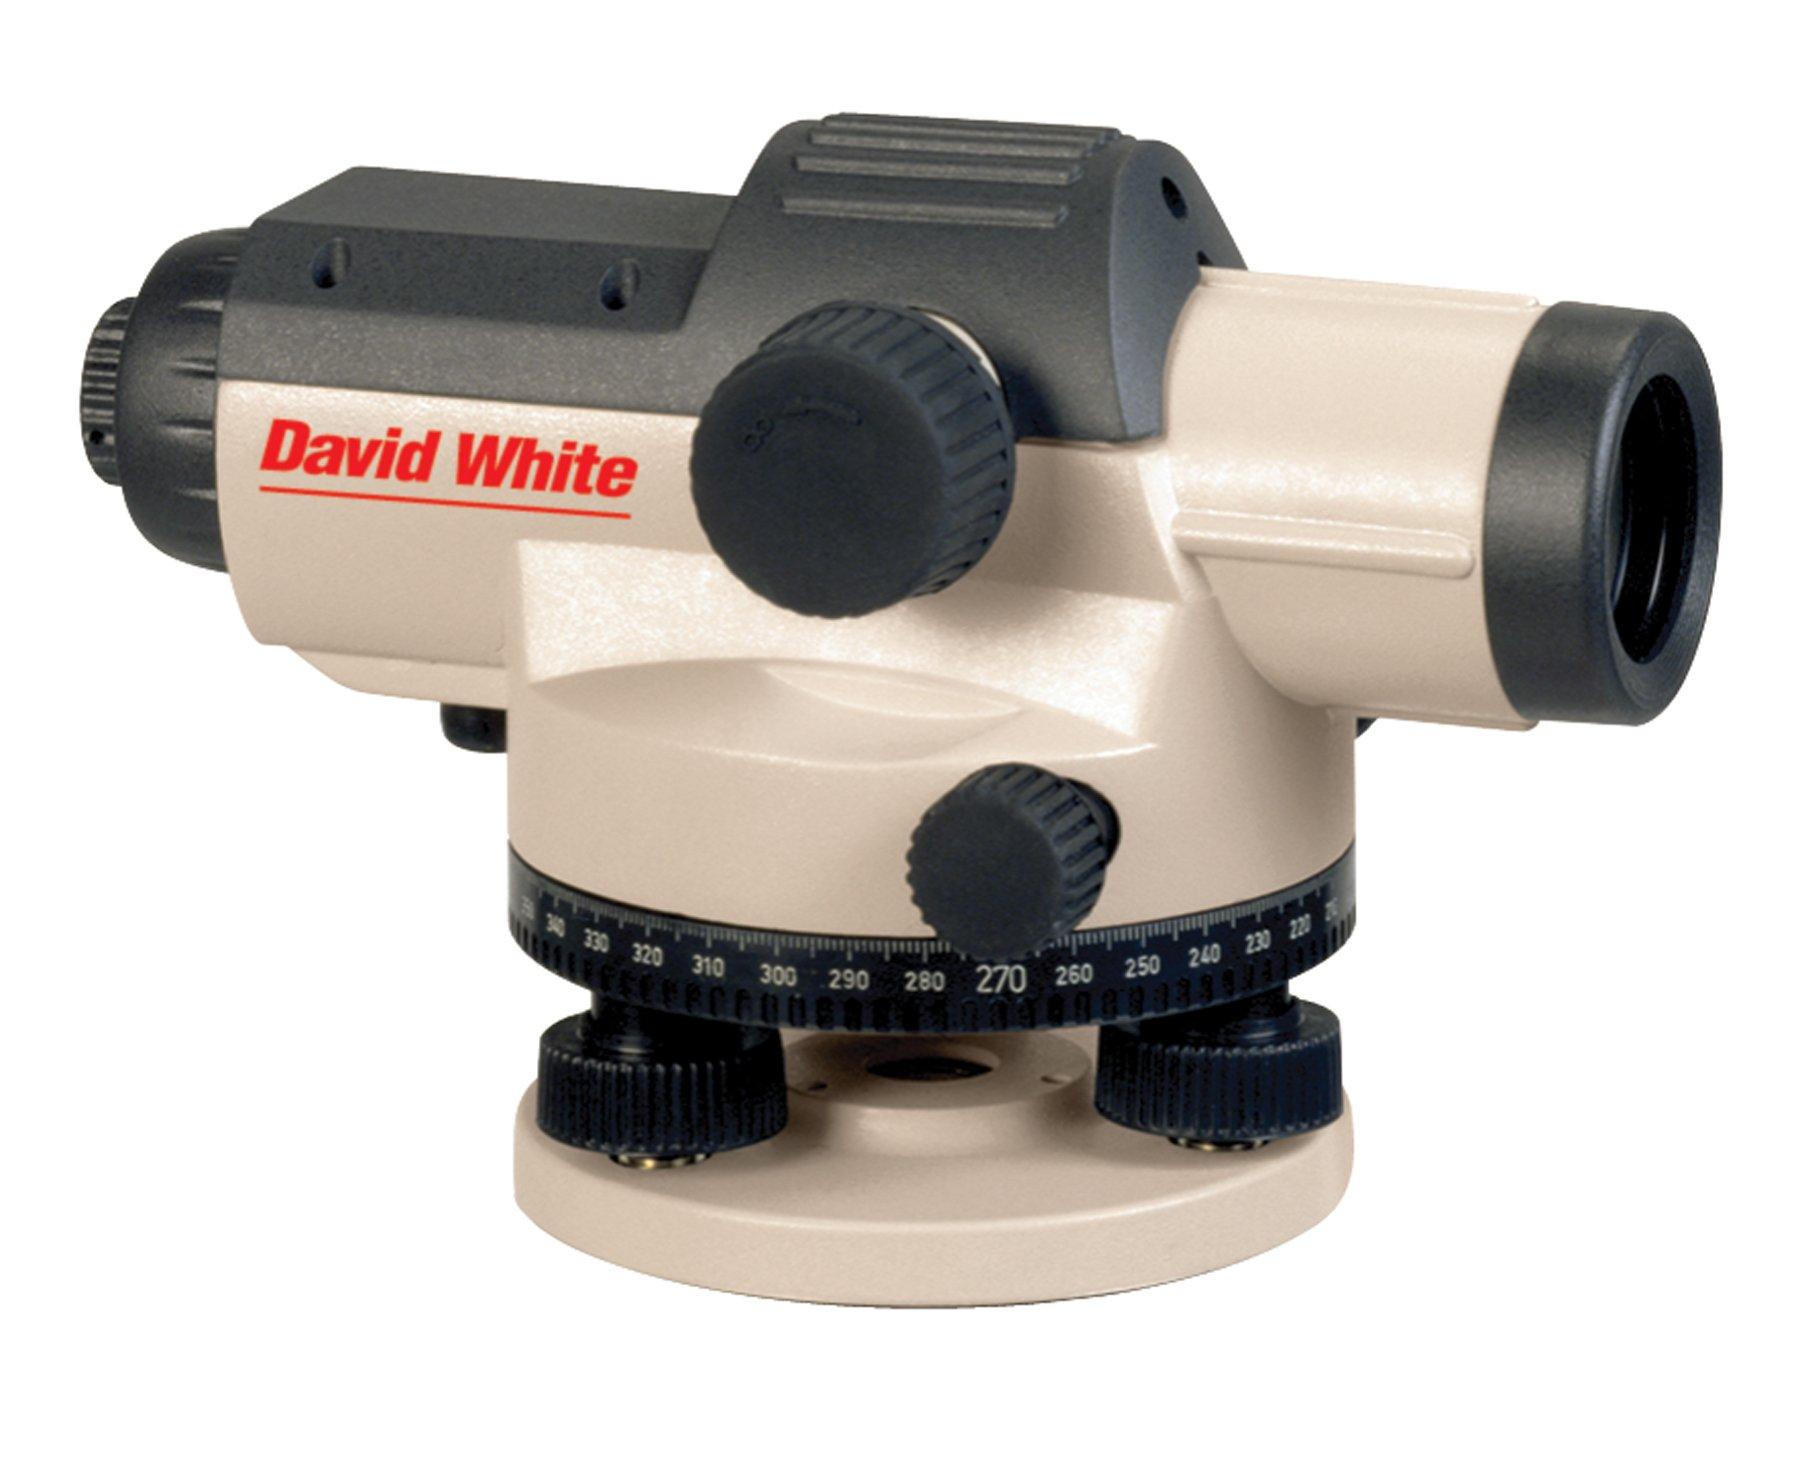 David White AL8-26 26-Power Automatic Optical Level